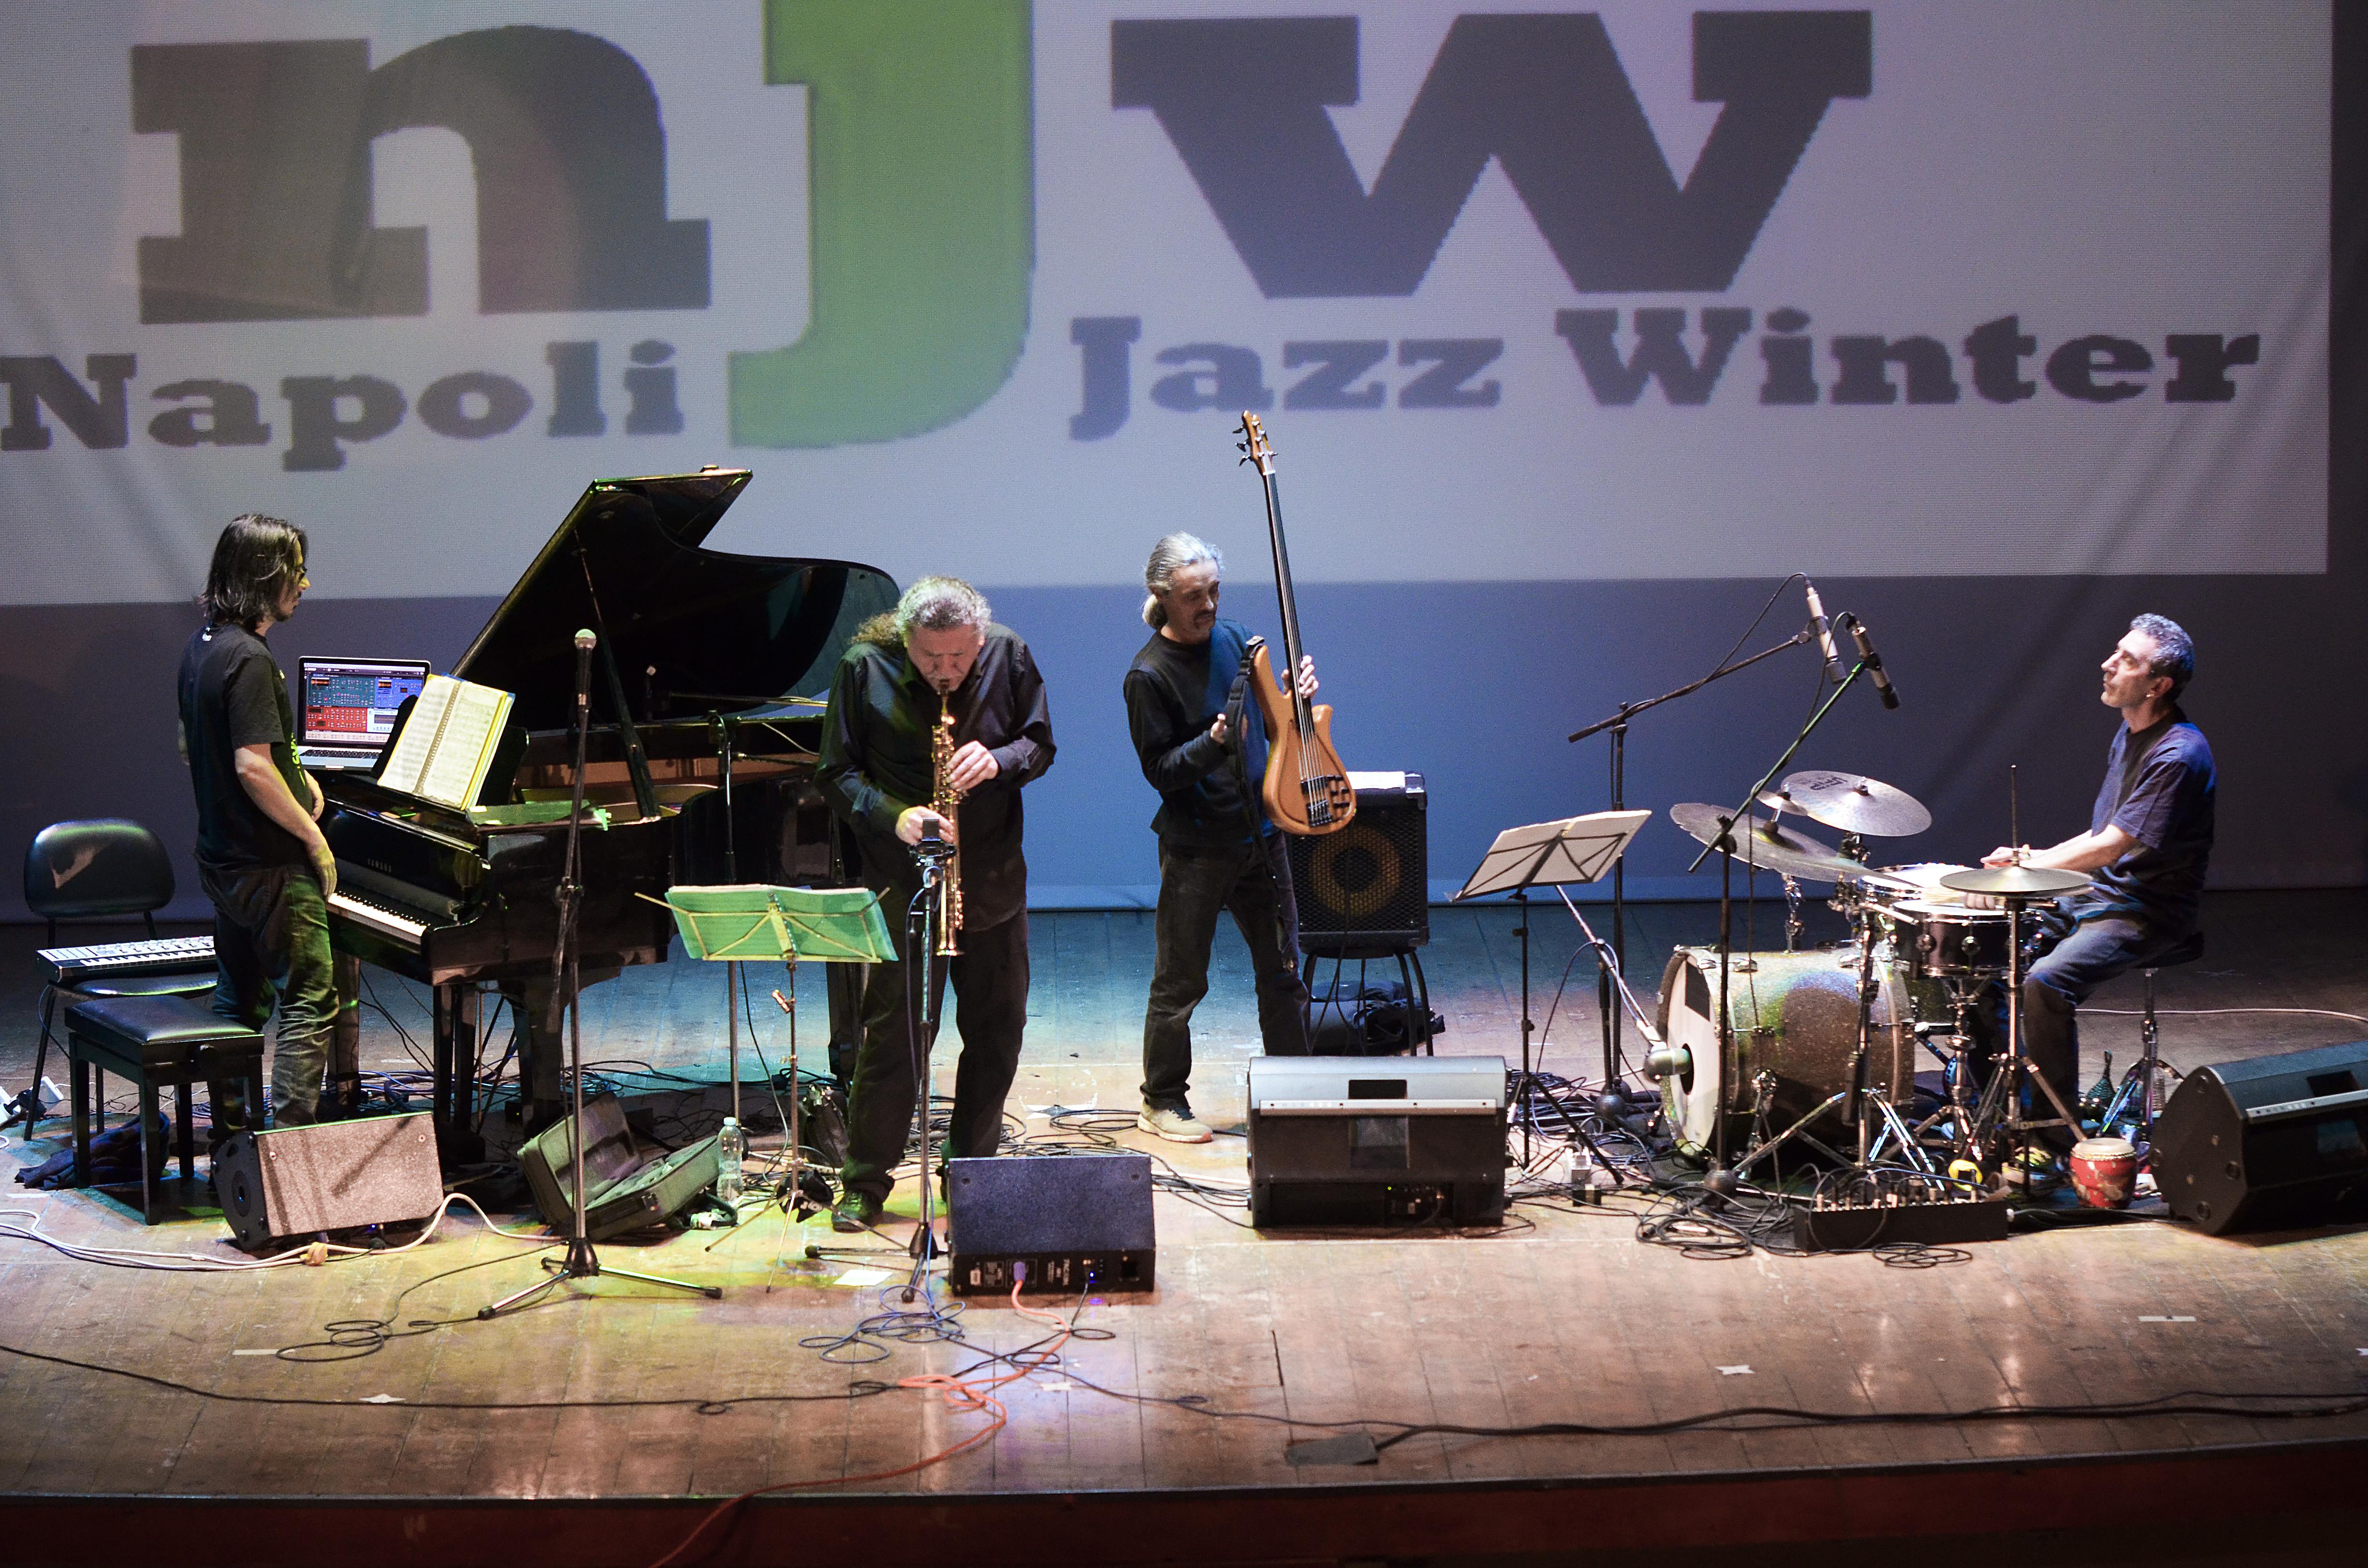 Javier Girotto e Aires Tango live @ Napoli jazz winter Ph Roberta Gioberti